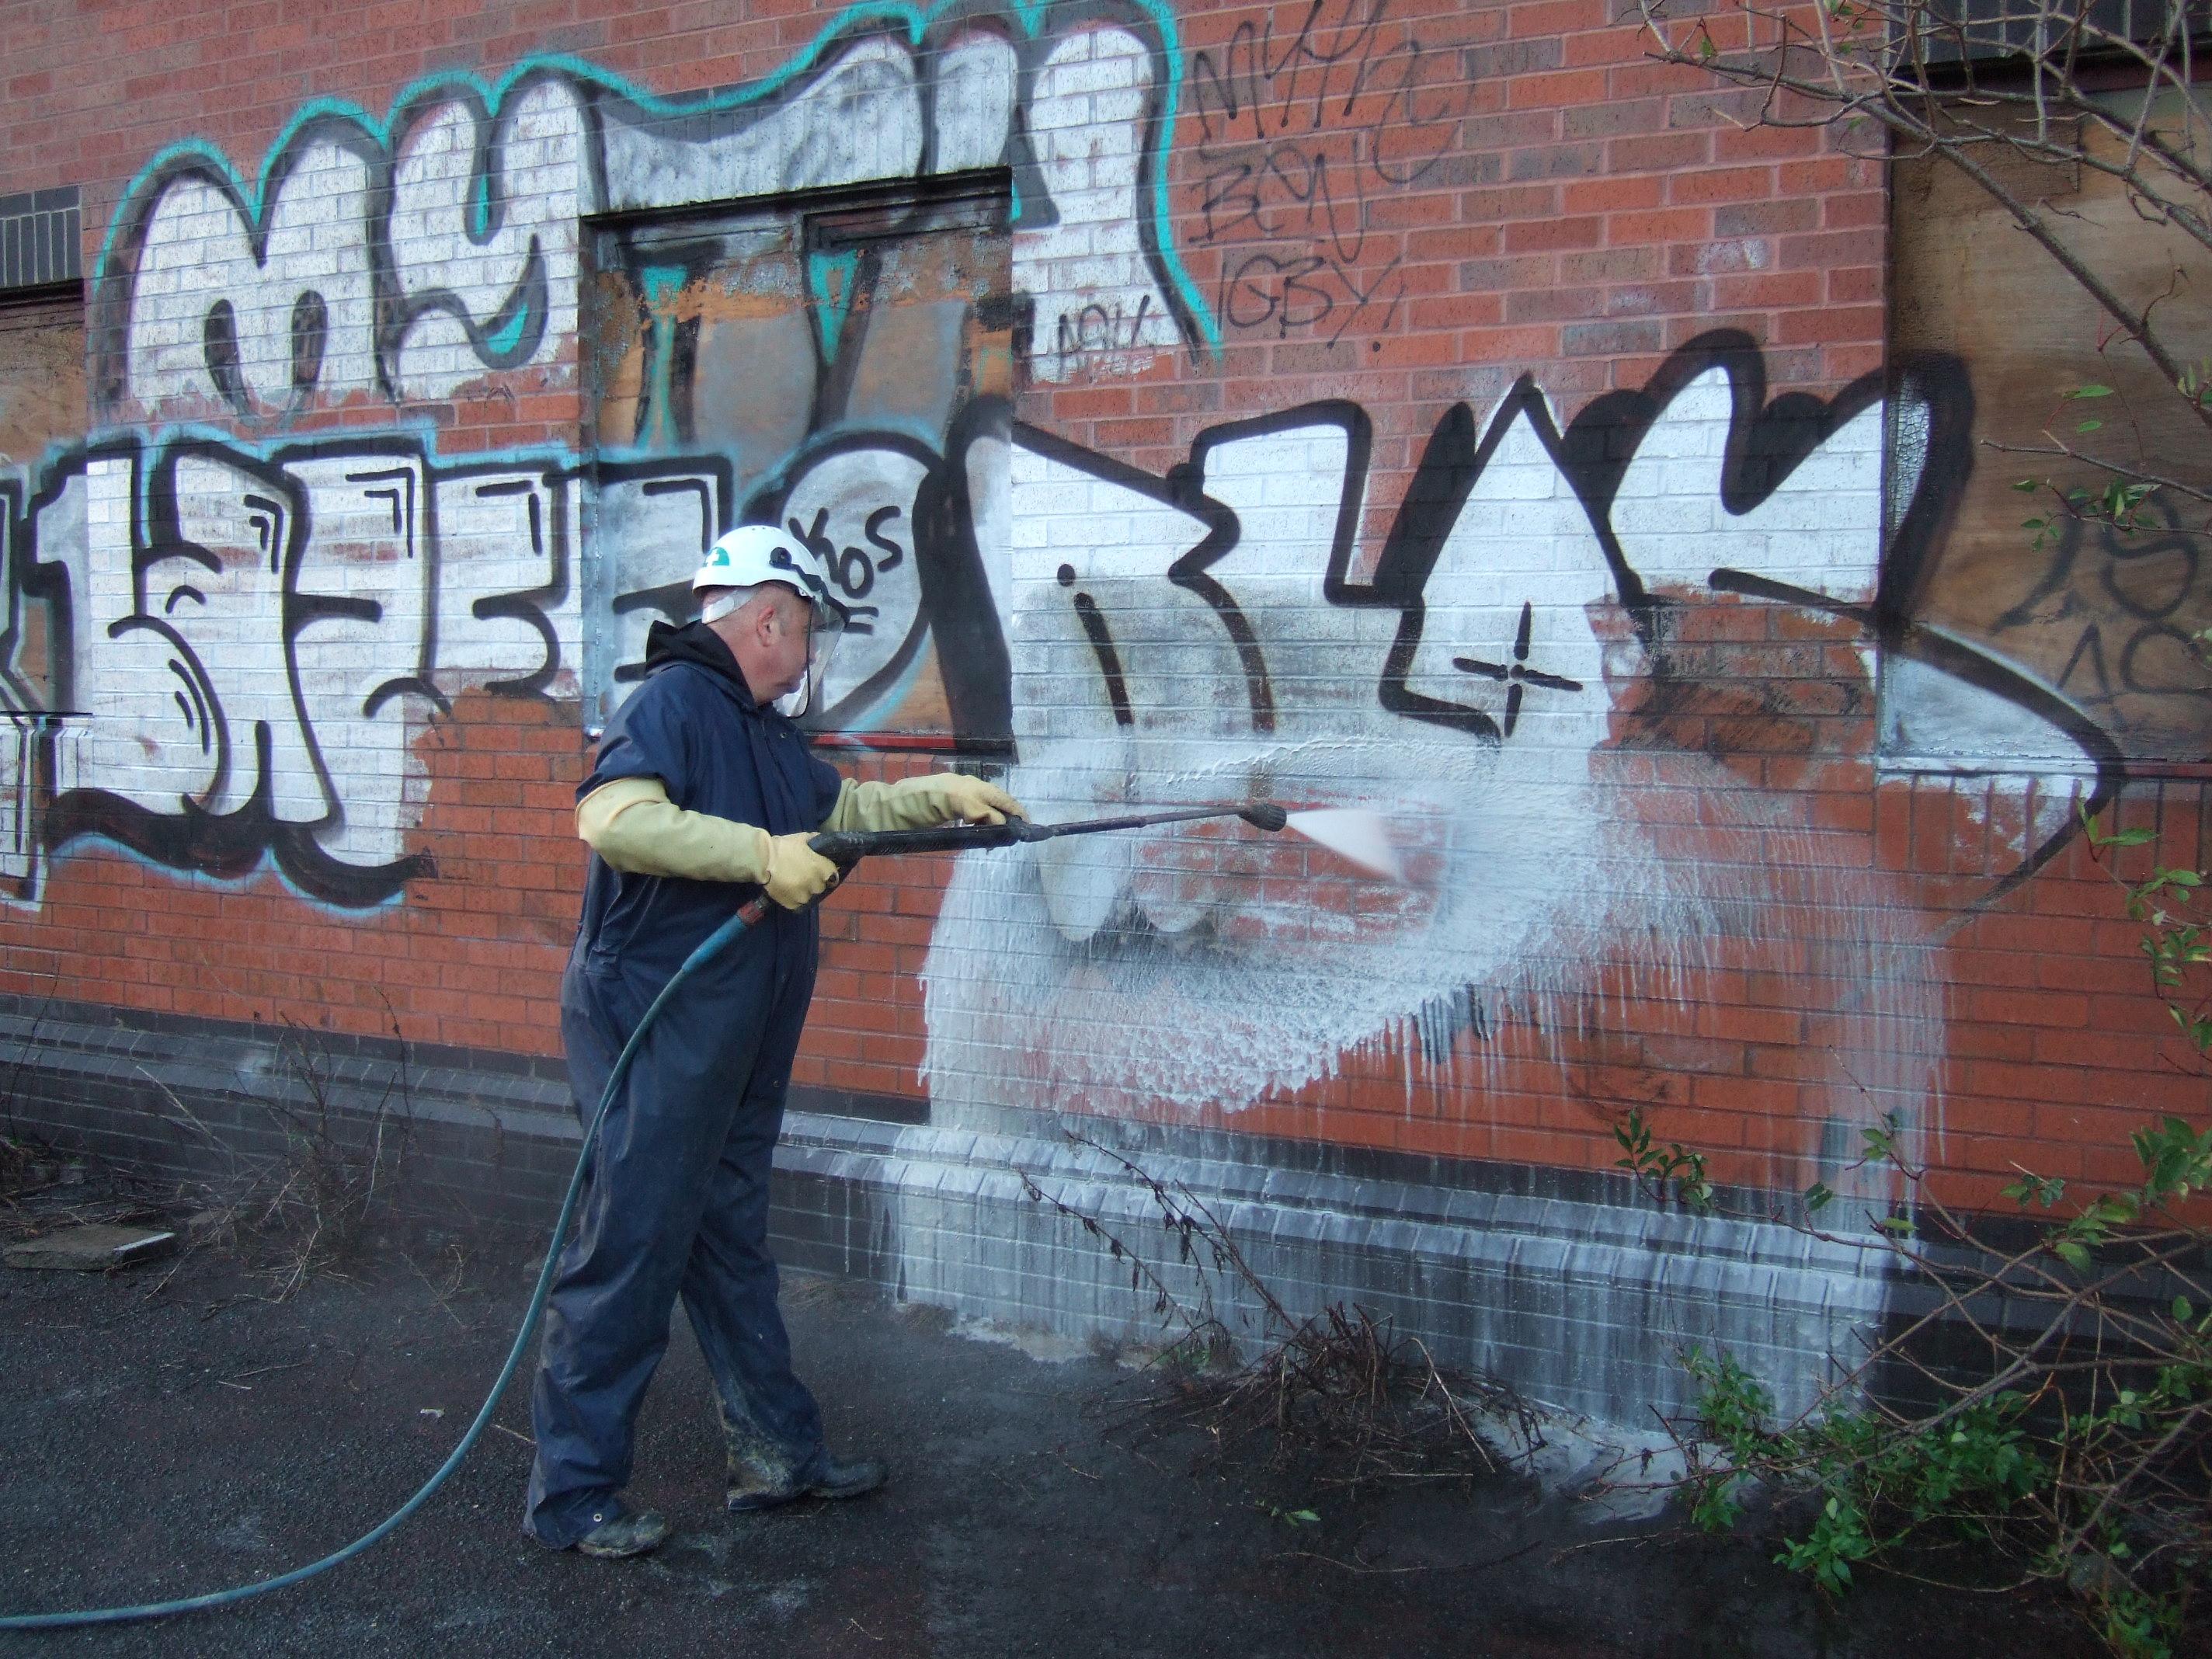 Graffiti Removal: During